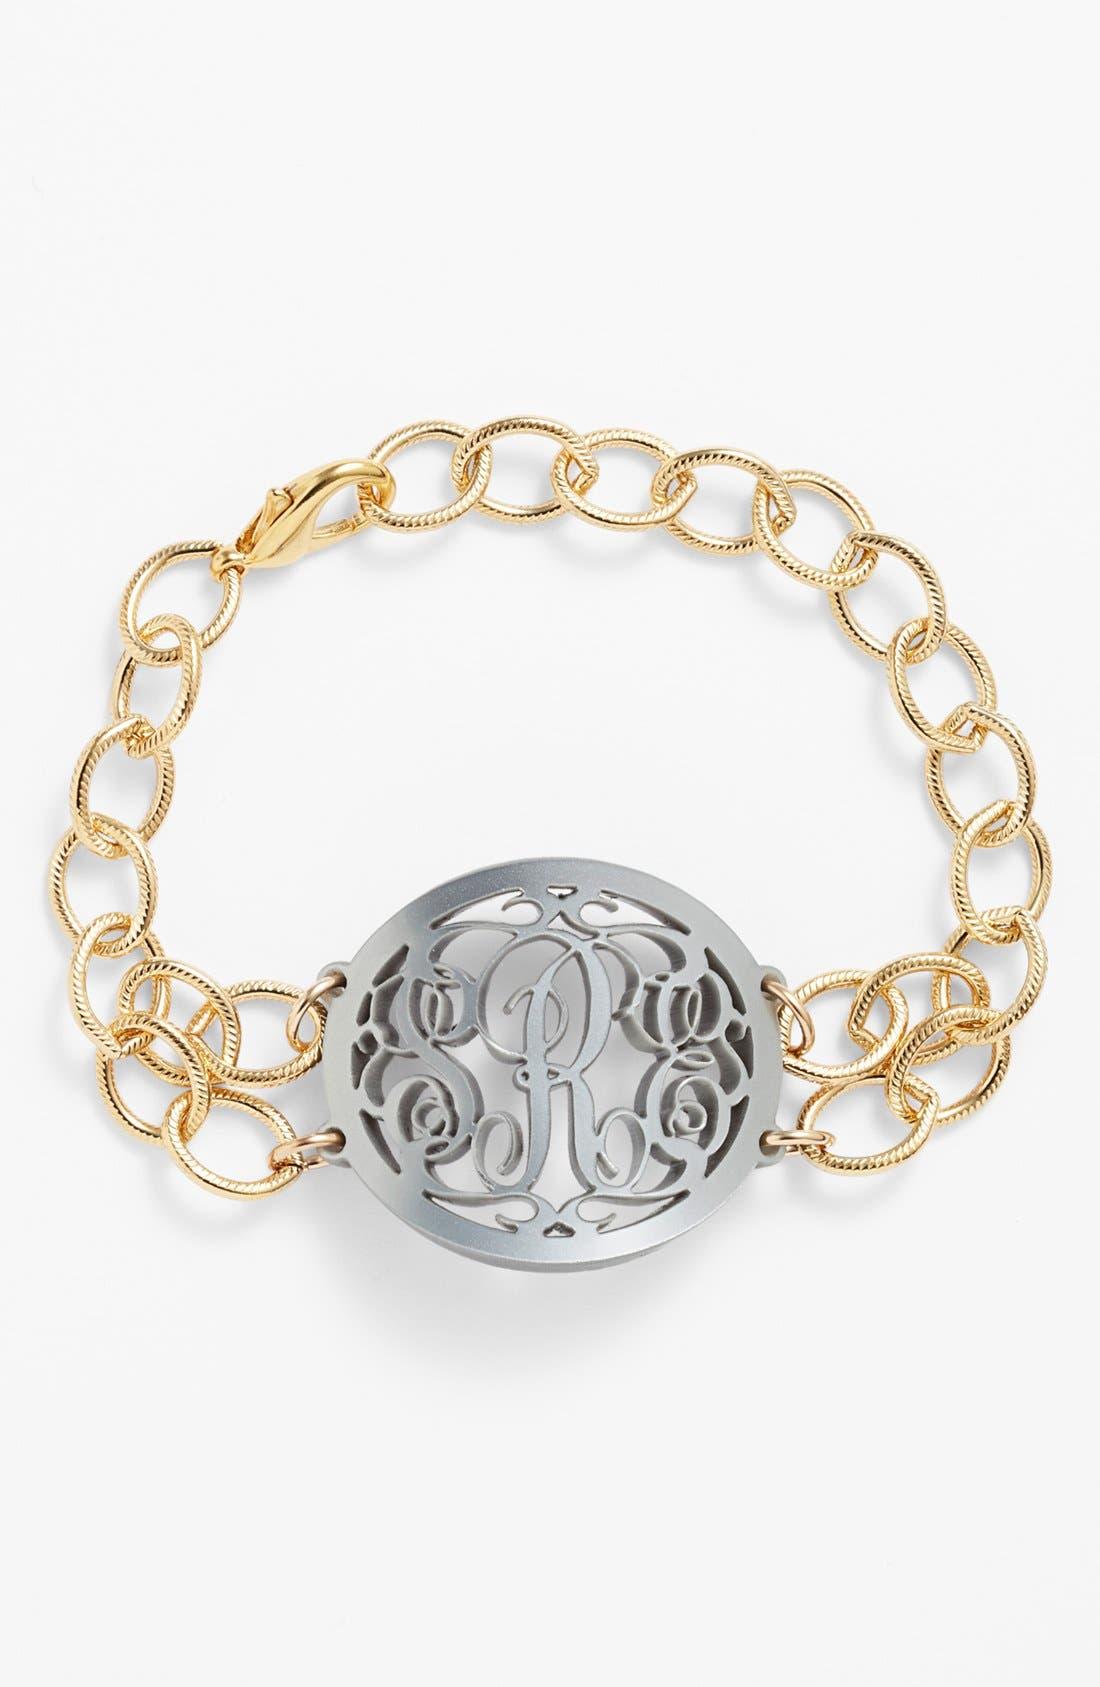 'Annabel' Medium Oval Personalized Monogram Bracelet,                             Main thumbnail 1, color,                             GUNMETAL/ GOLD